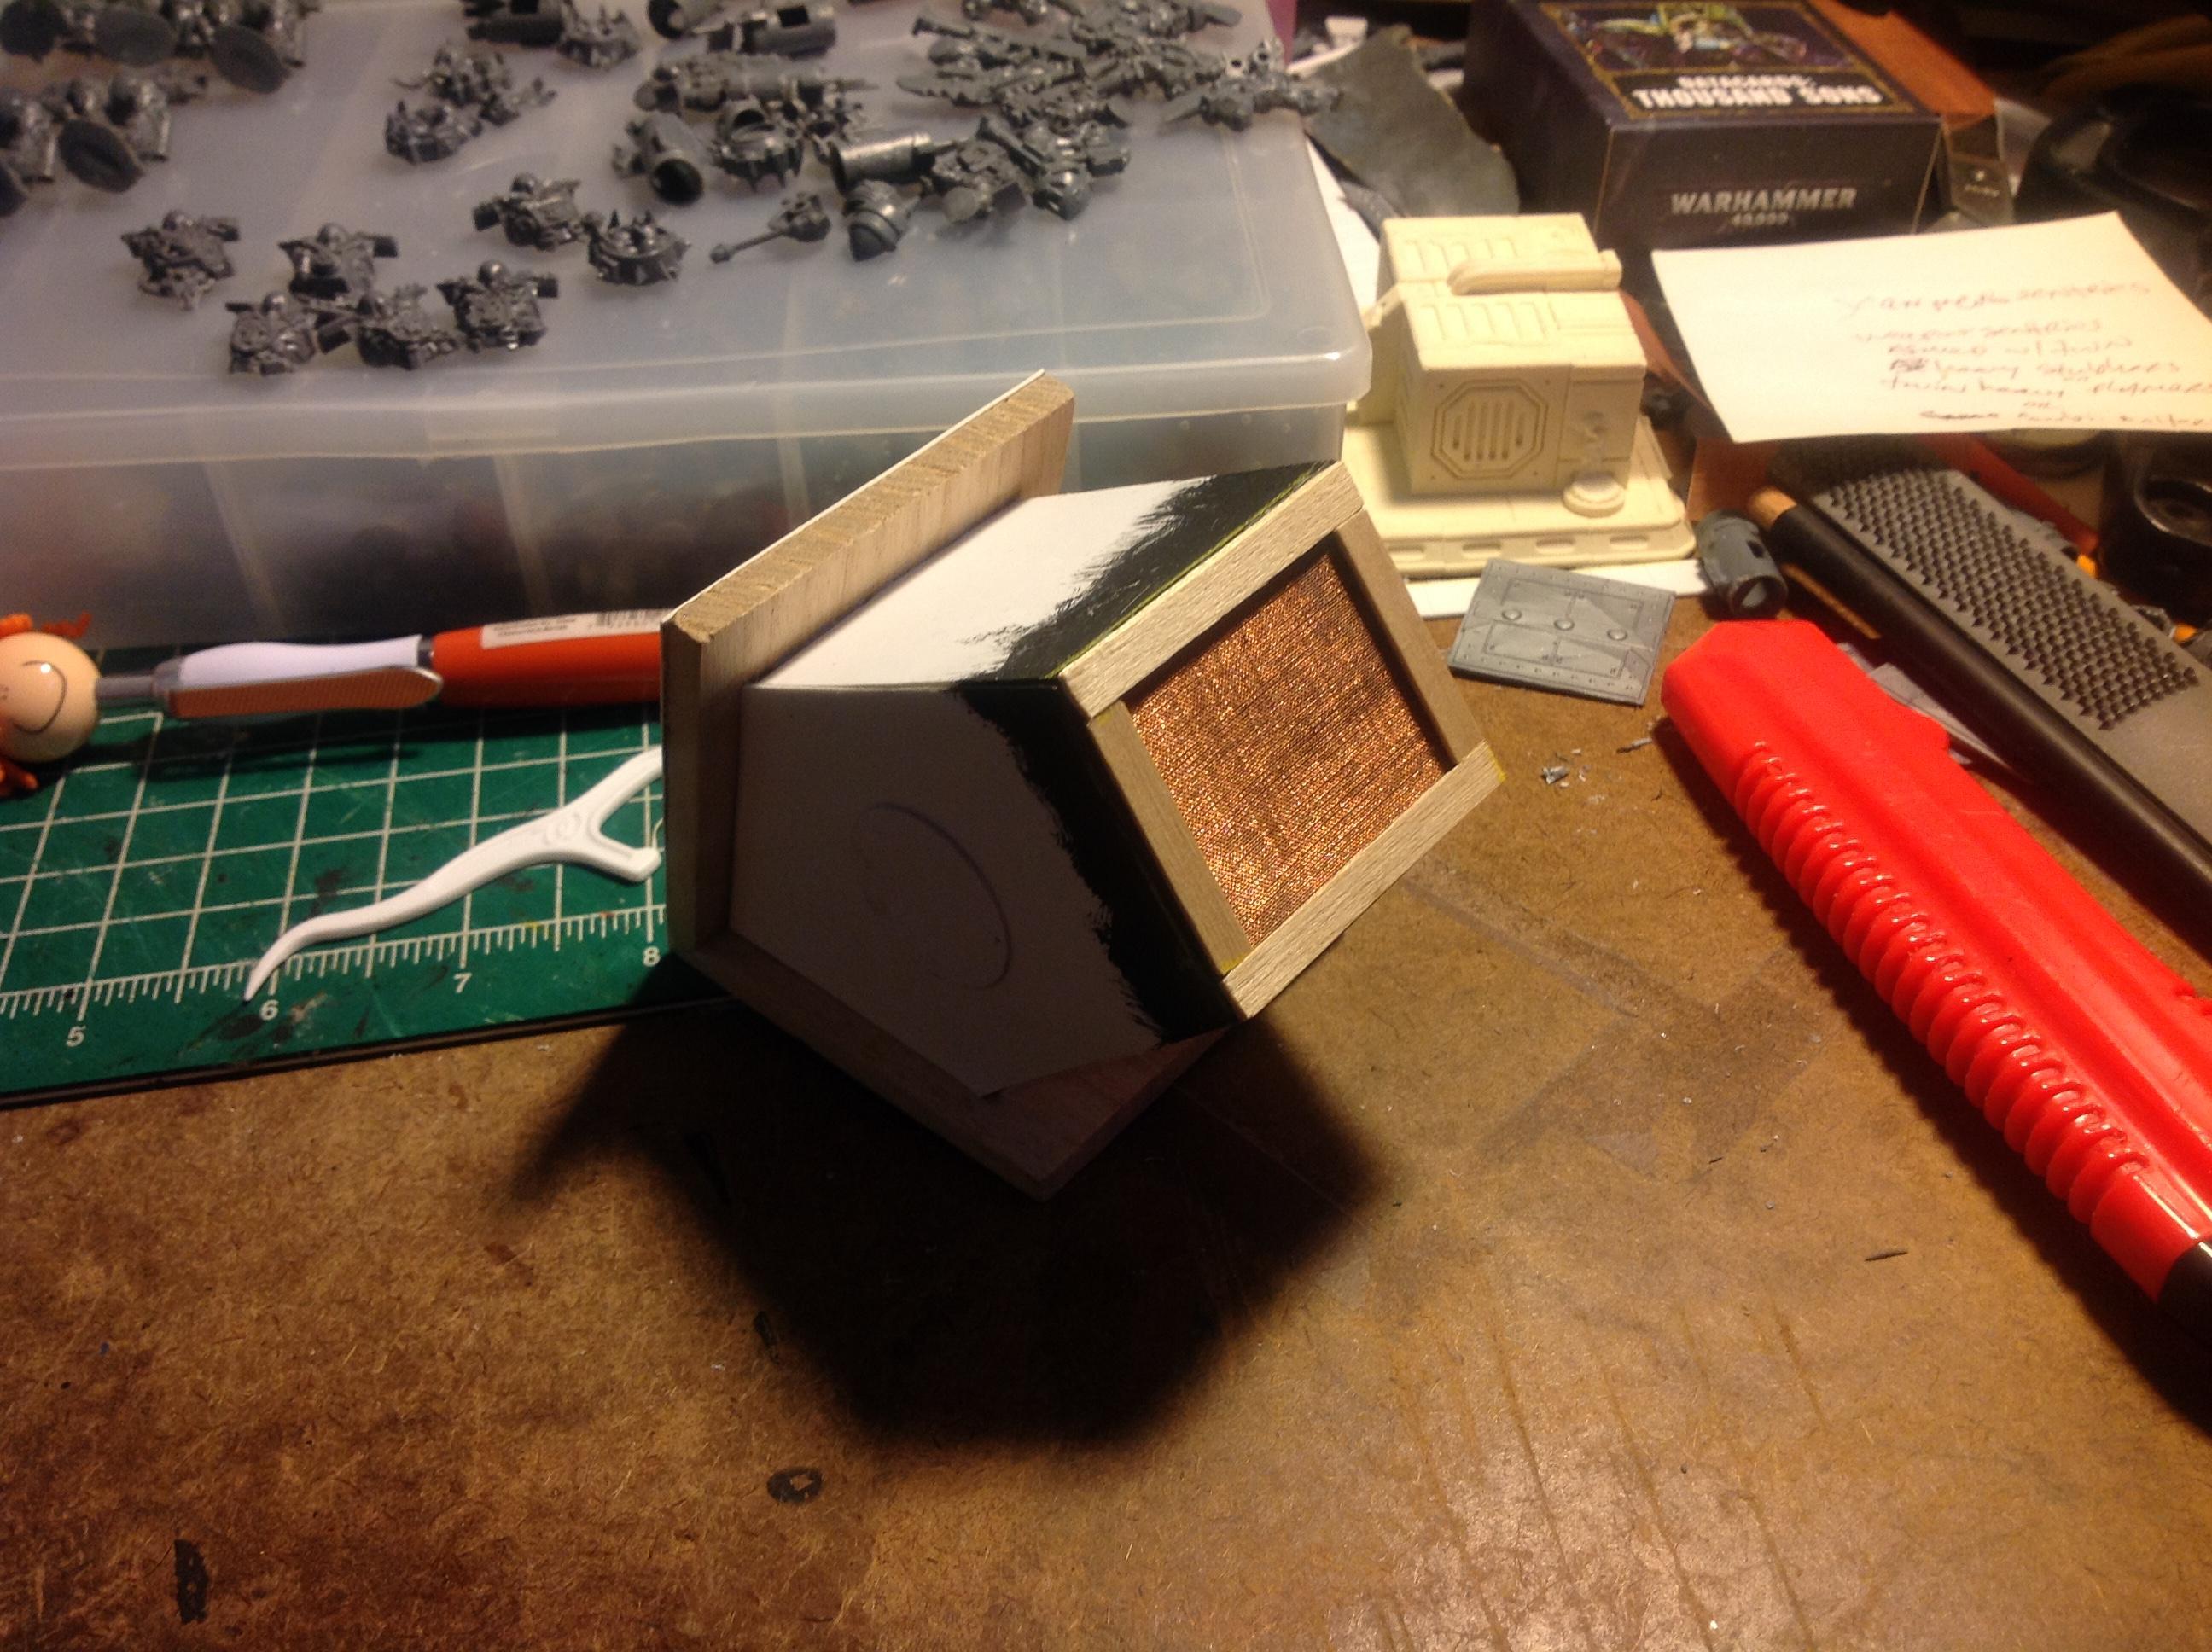 Found Objects, Scratch Build, Spacehulk, Terrain, Vent, Waaazag, Work In Progress